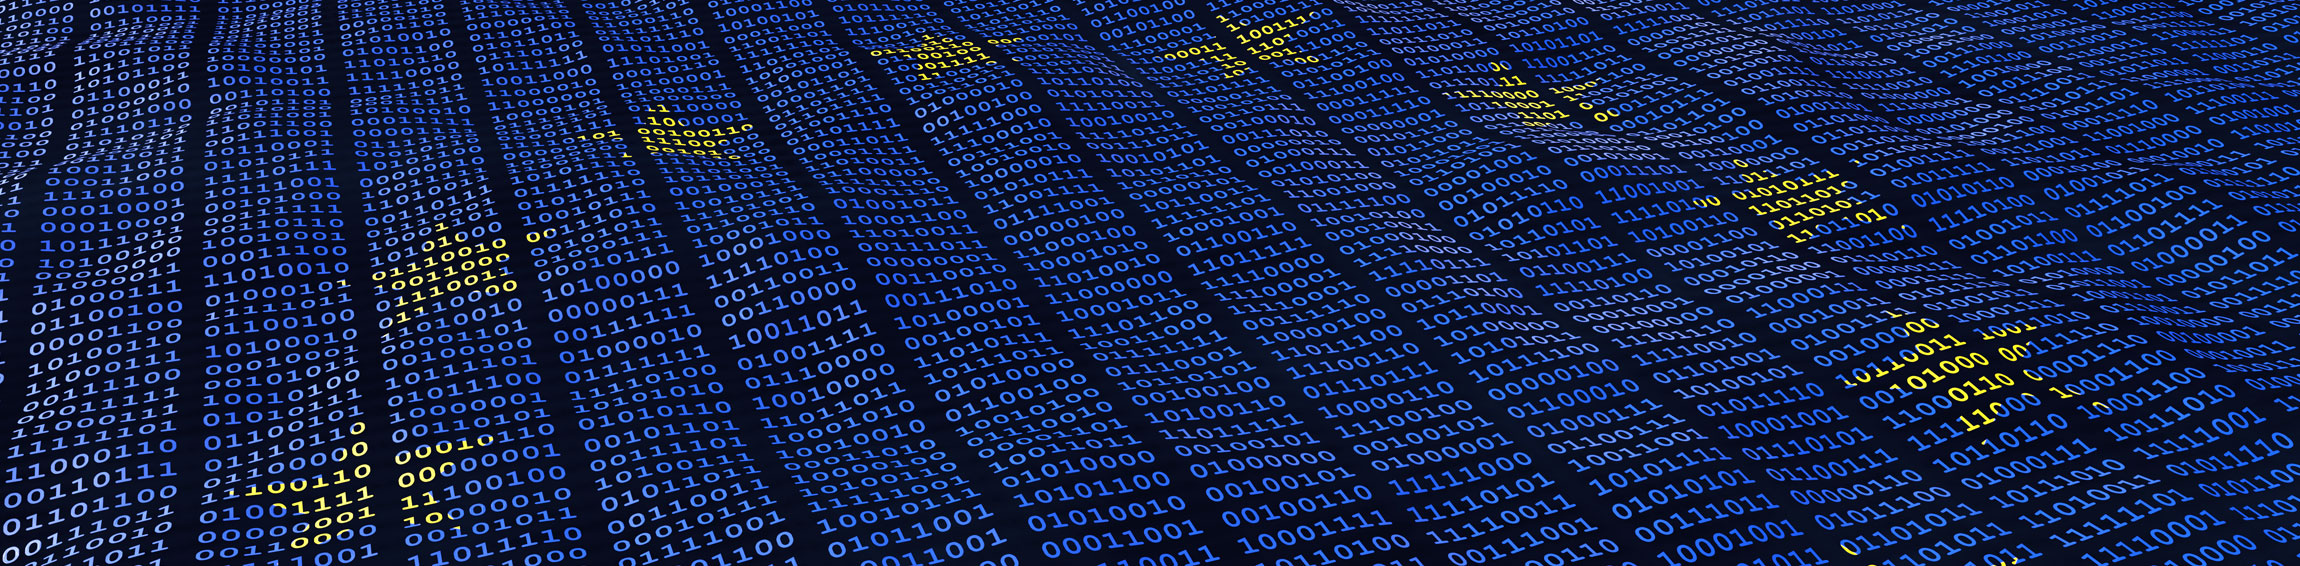 Open Access BPO Achieves GDPR compliance